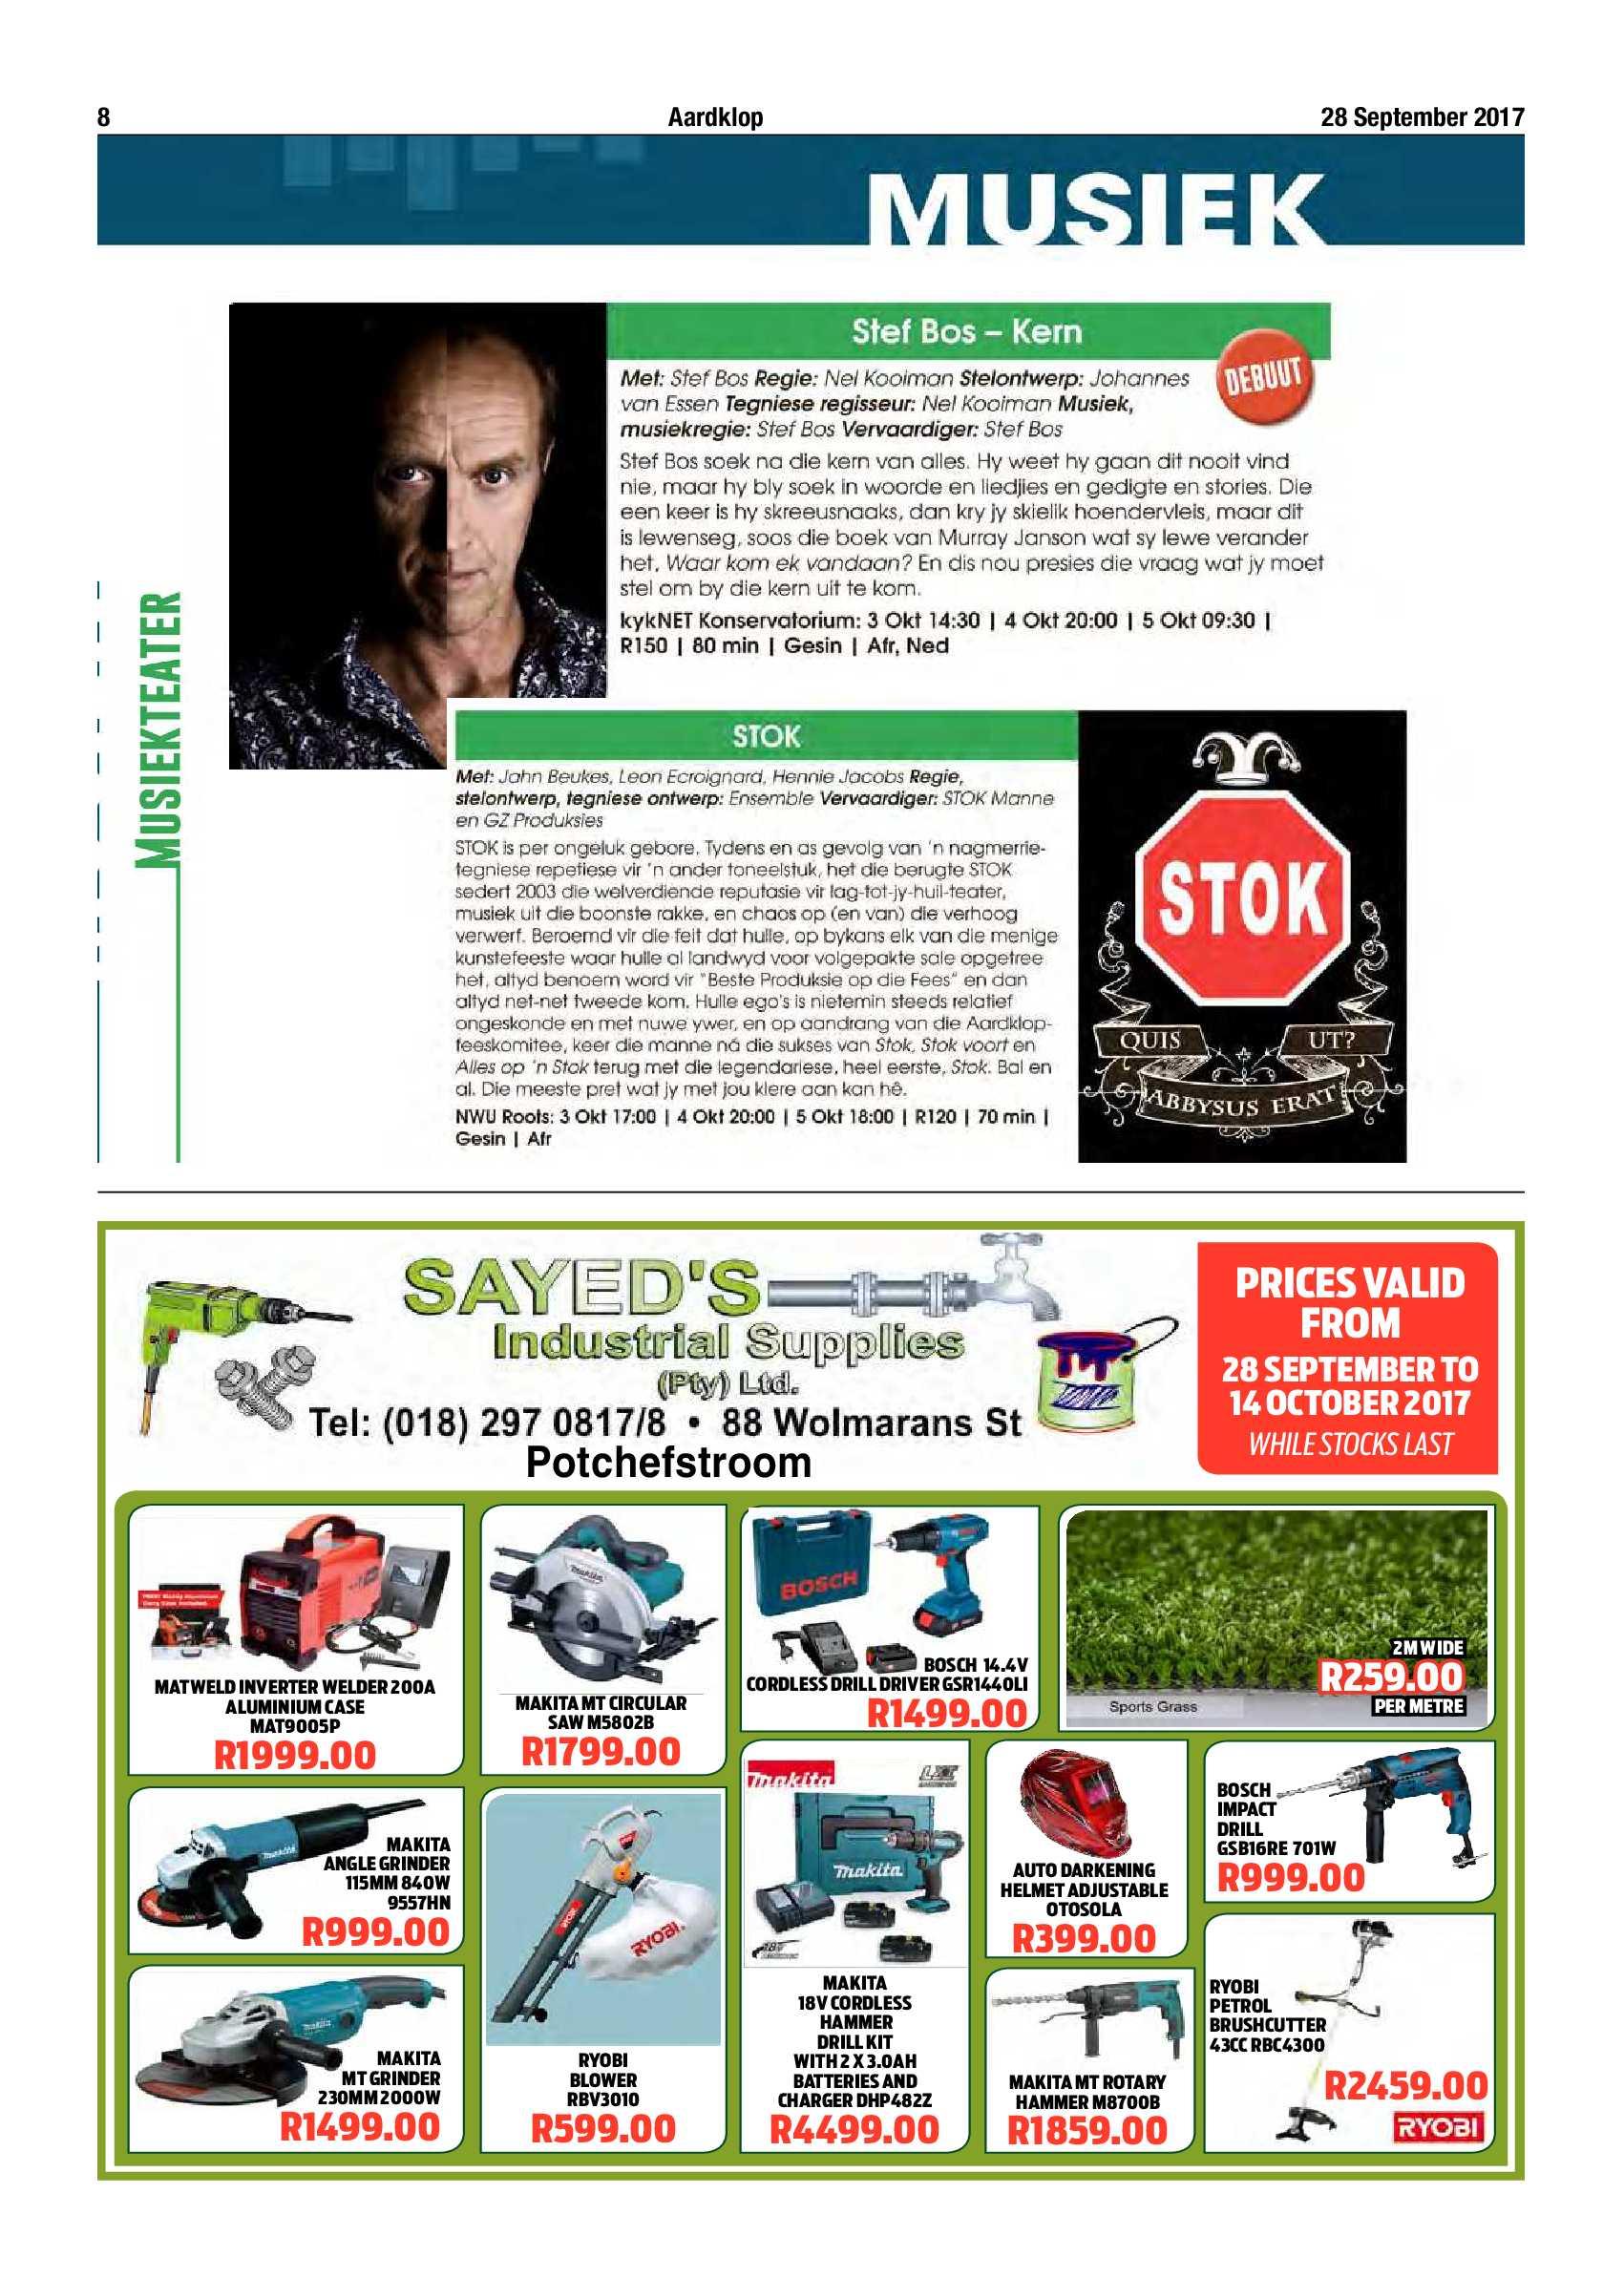 aardklop-2017-epapers-page-8